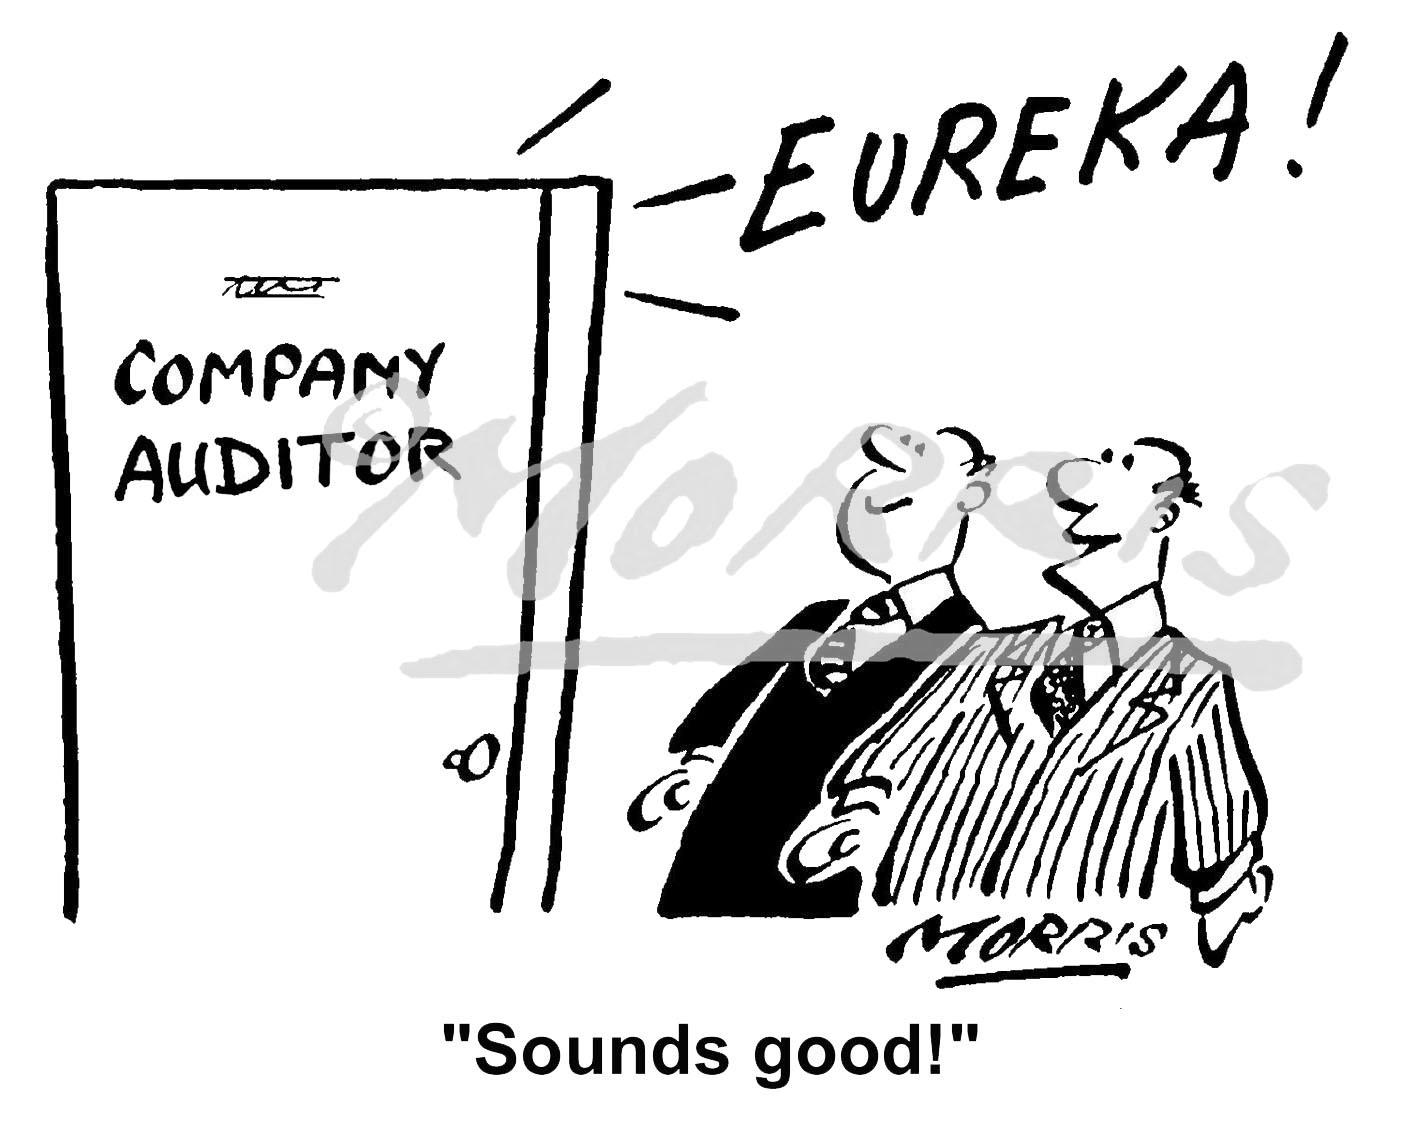 Accountancy cartoon – Ref: 2006bwus